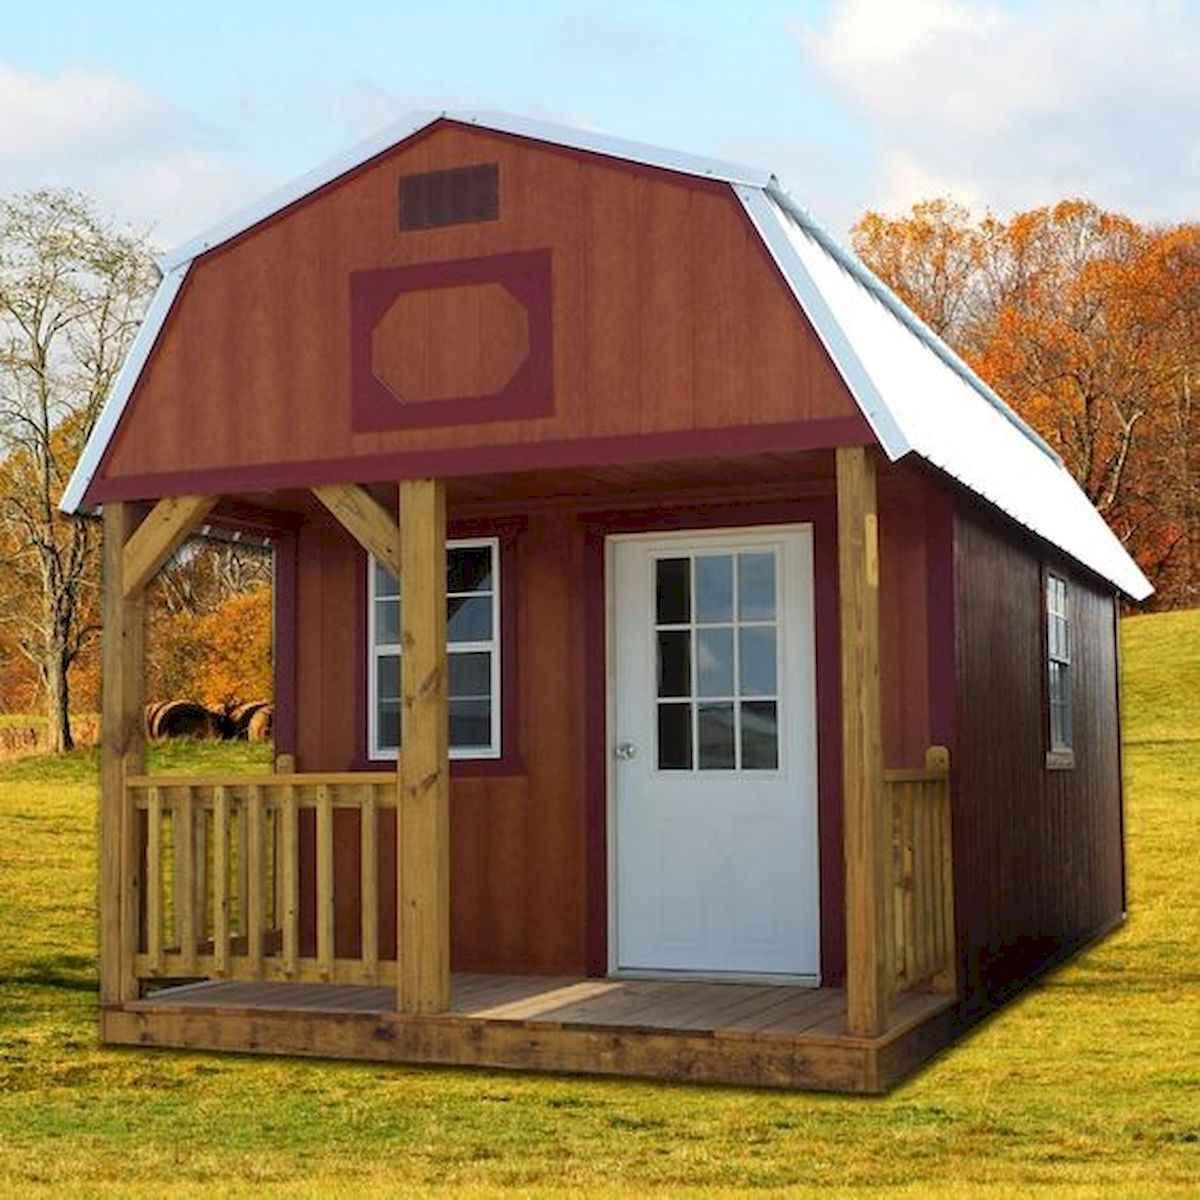 70 Suprising Small Log Cabin Homes Design Ideas (64)